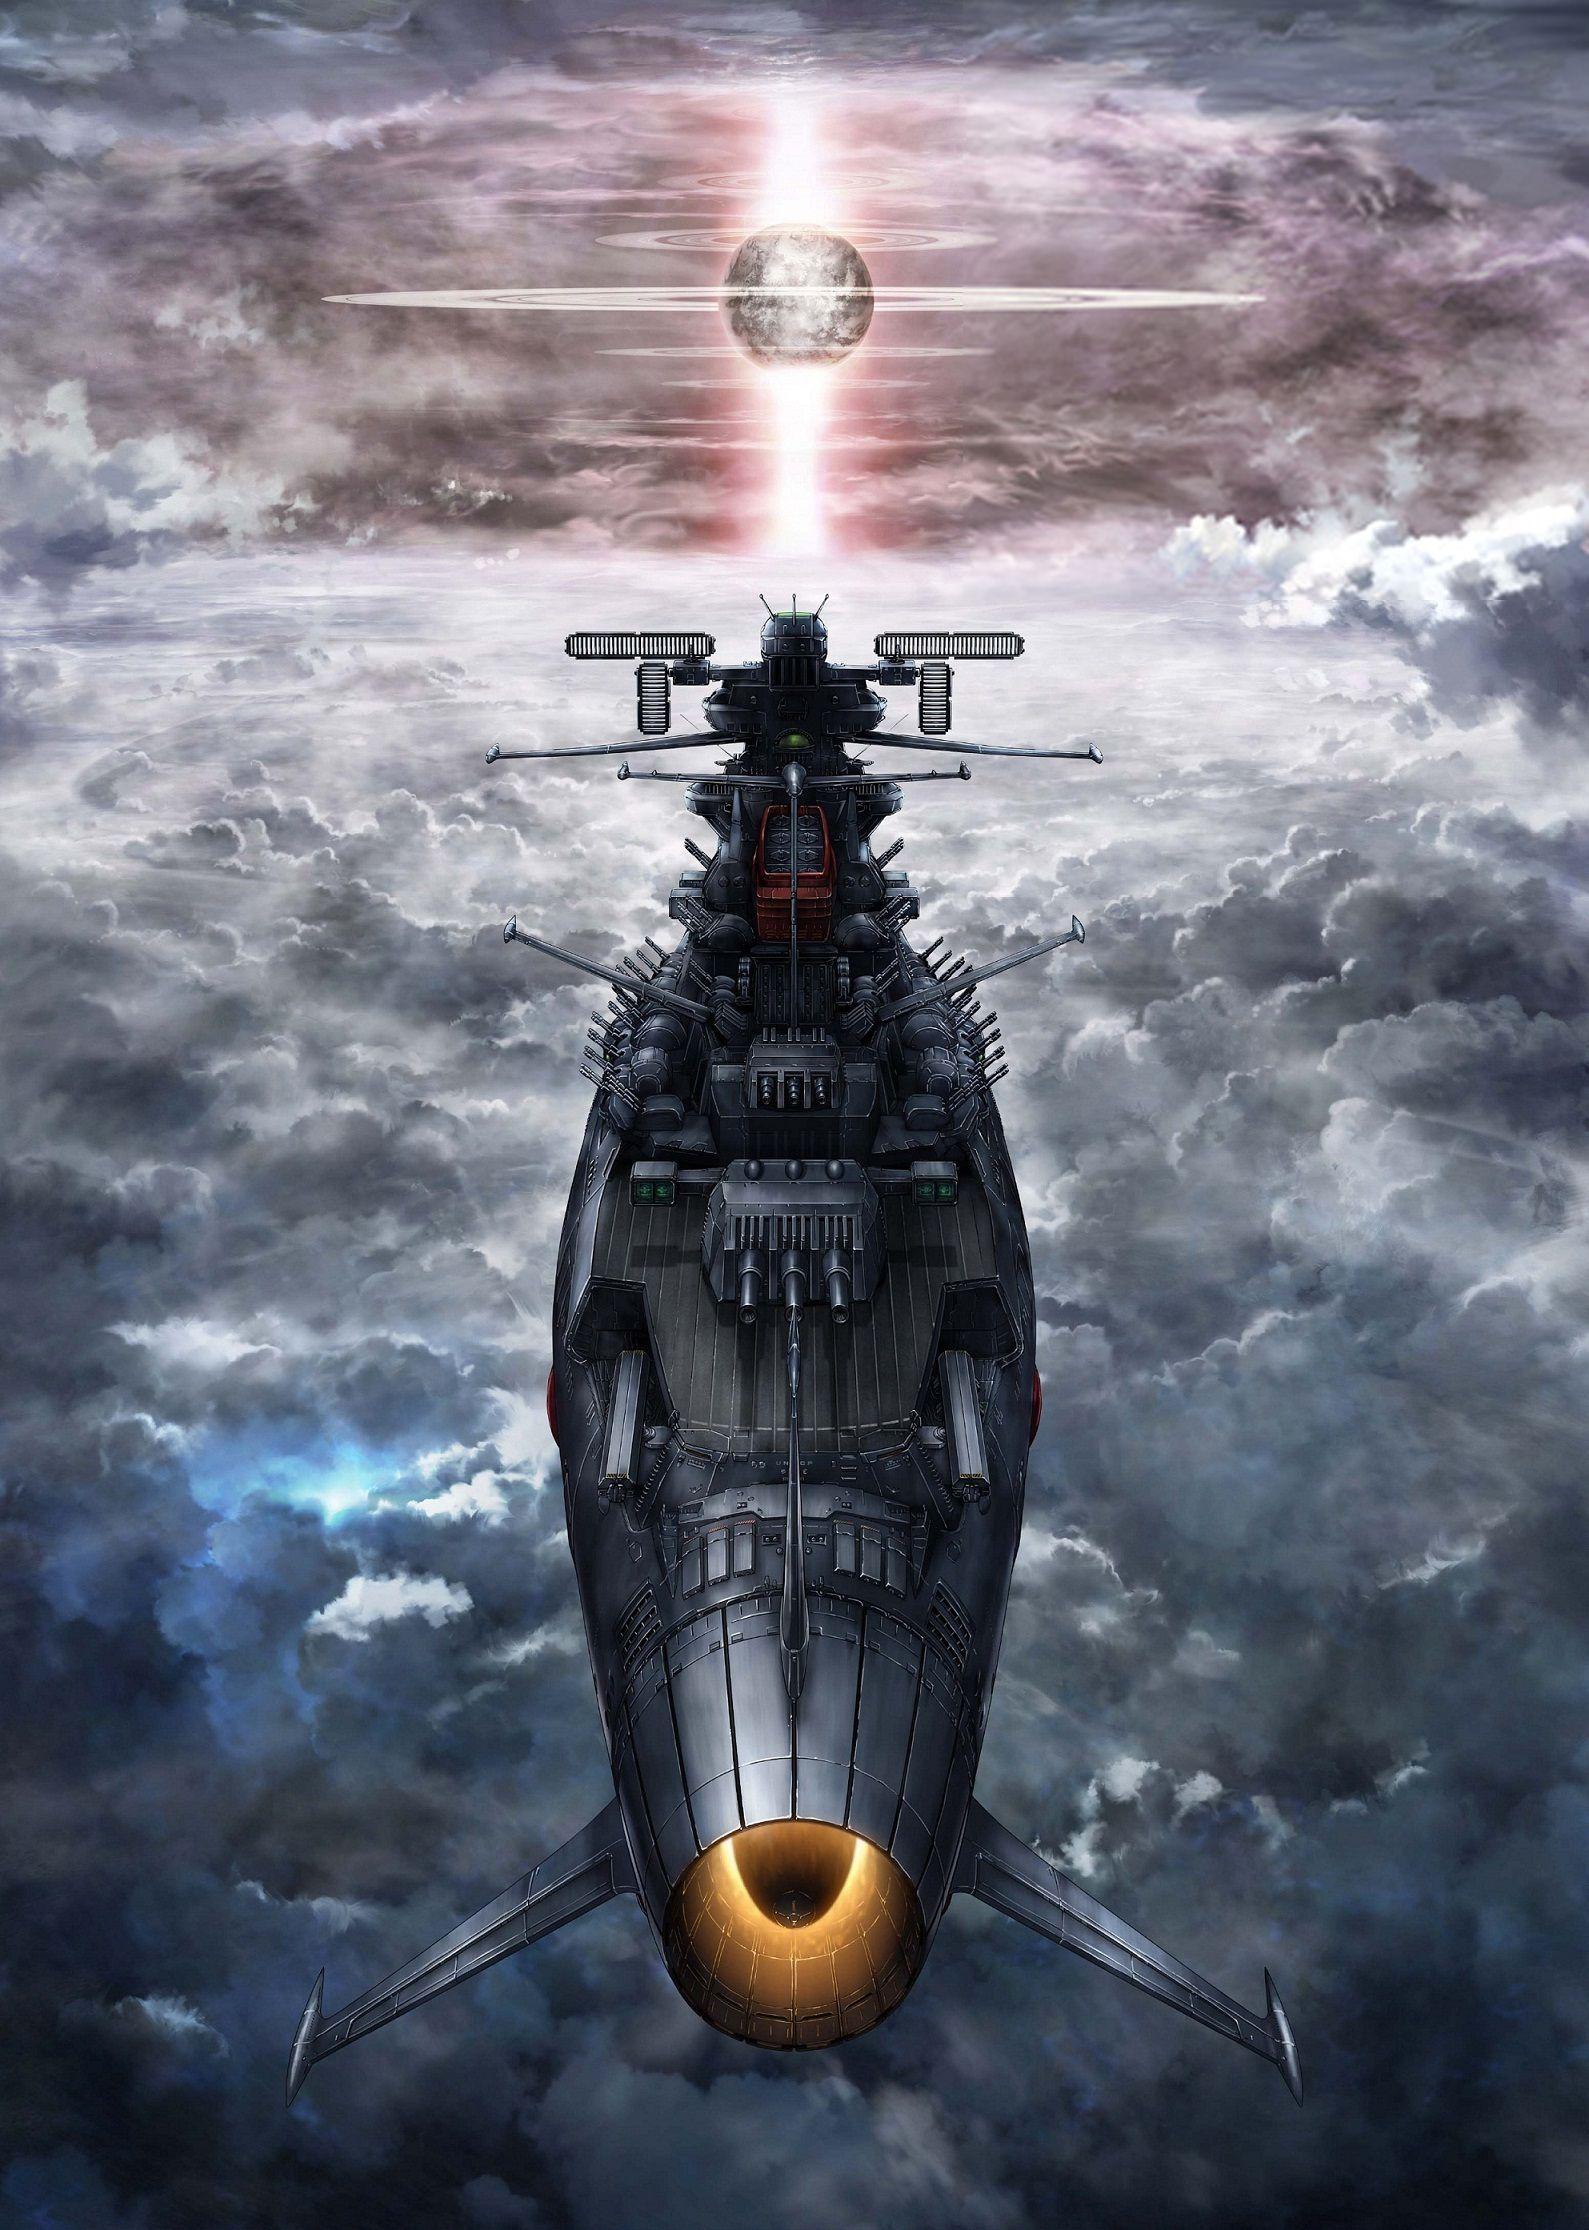 YAMATO 2199 Coming Home... Space battleship